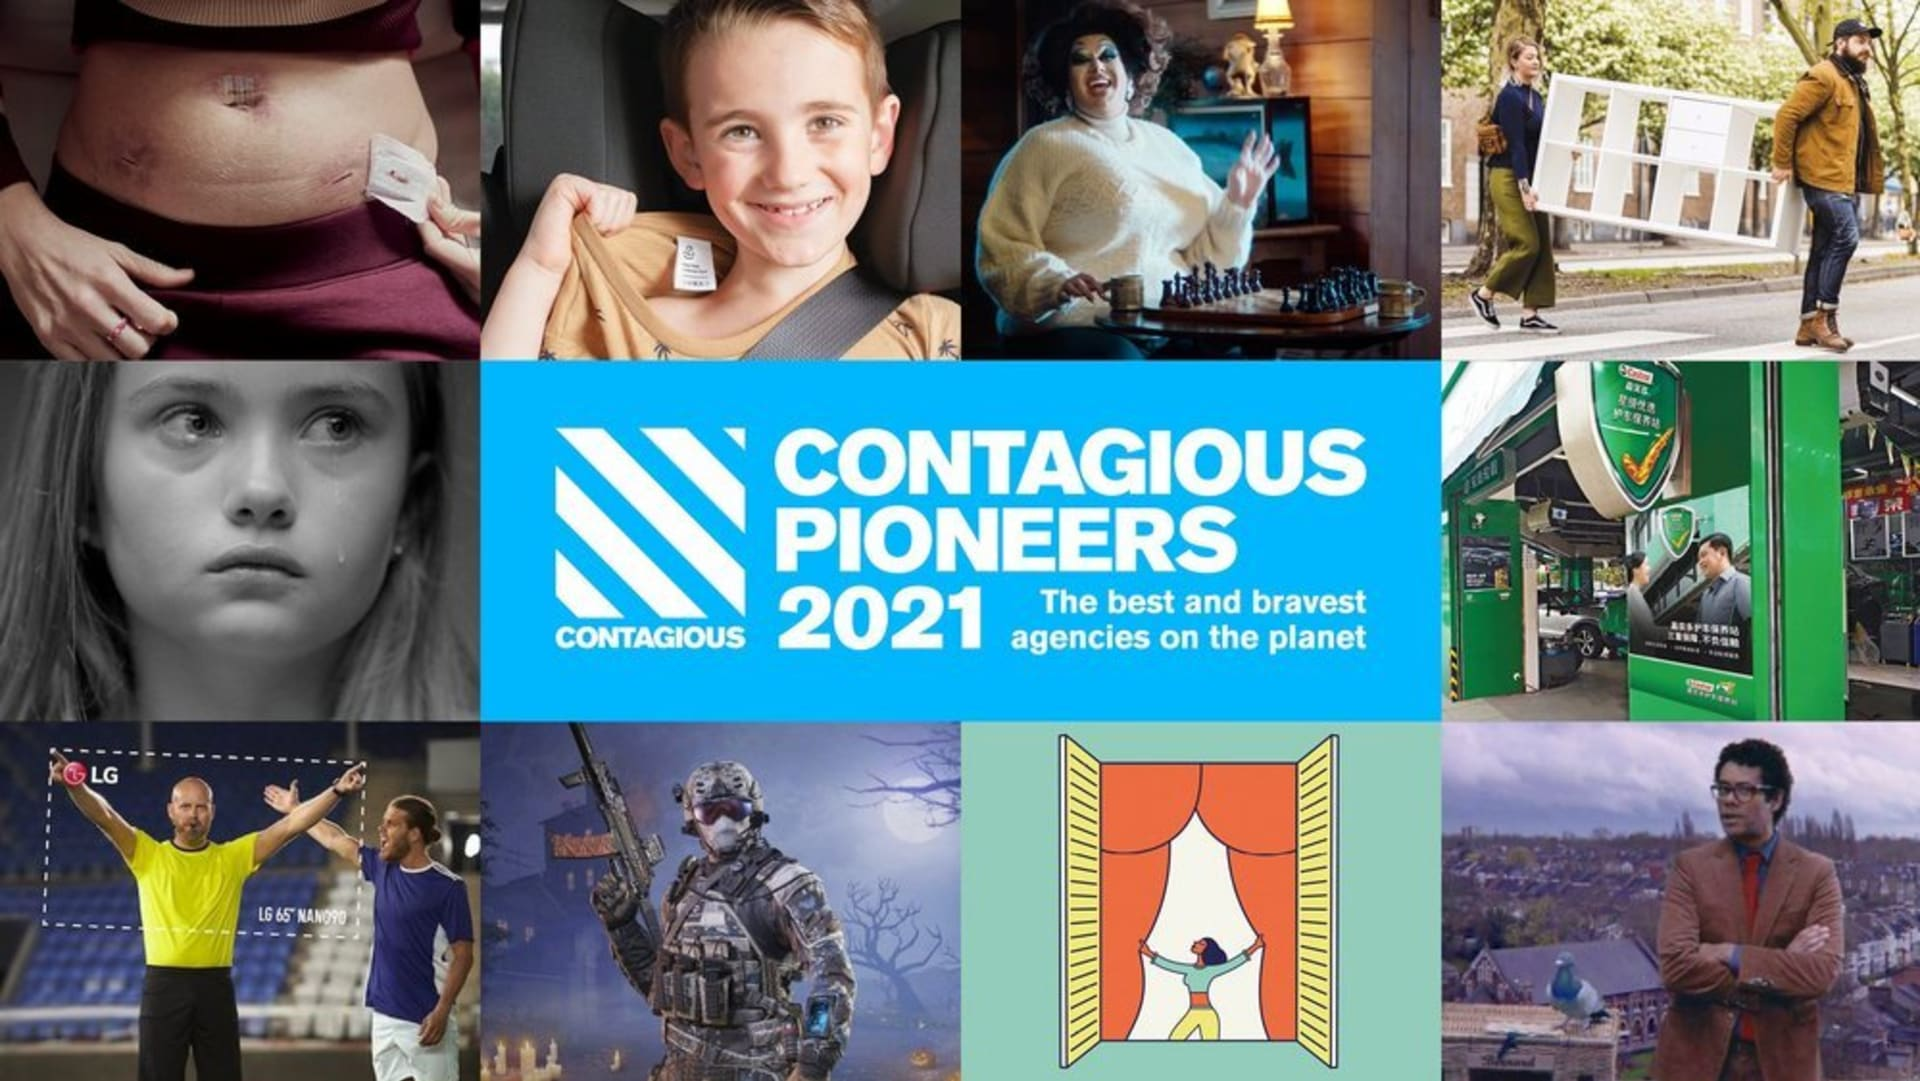 Contagious Pioneers 2021 hero visual